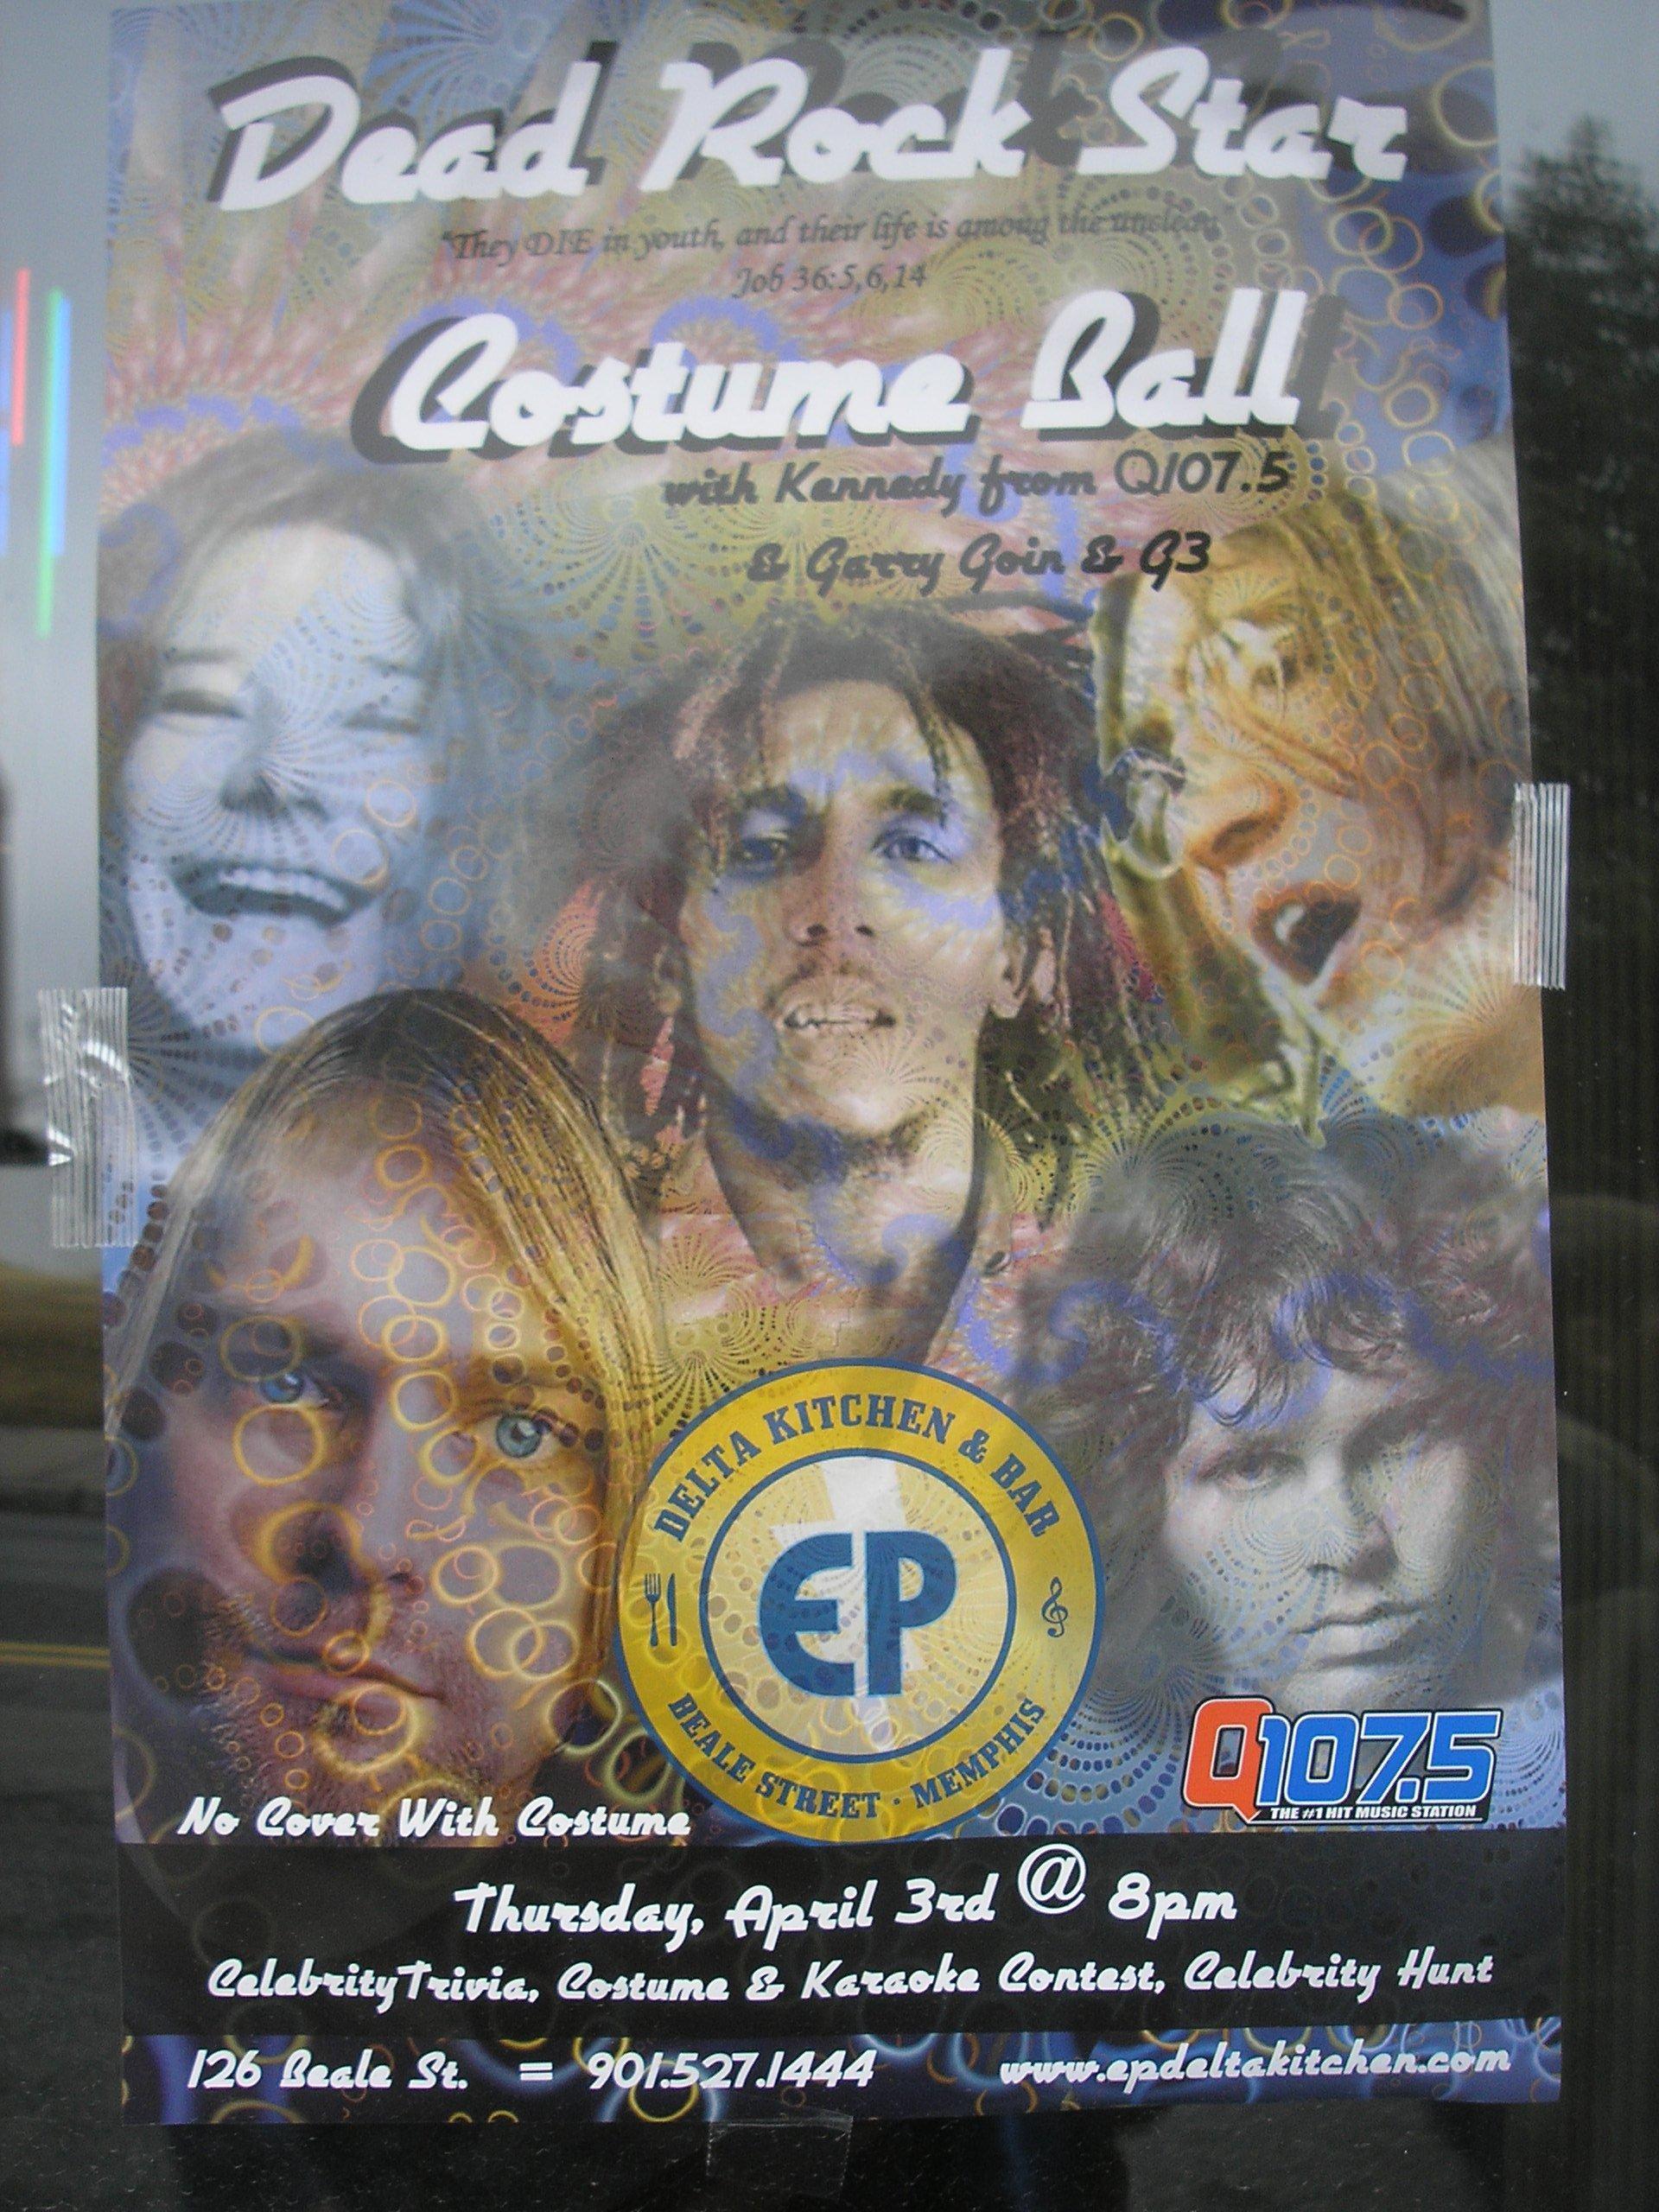 Party Like A Dead Rock Star Paul Ryburn S Journal